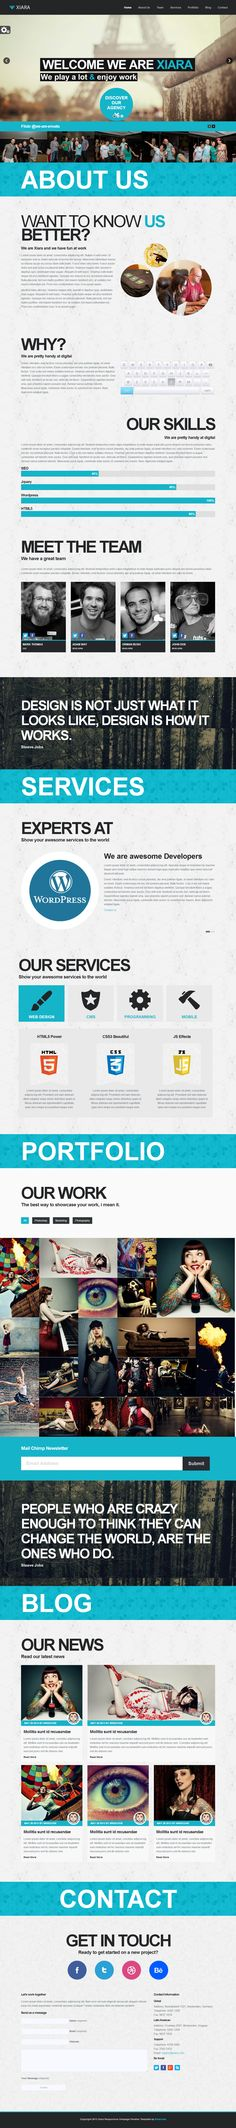 Onepage Parallax HTML Template by ~WordPressAwards on deviantART